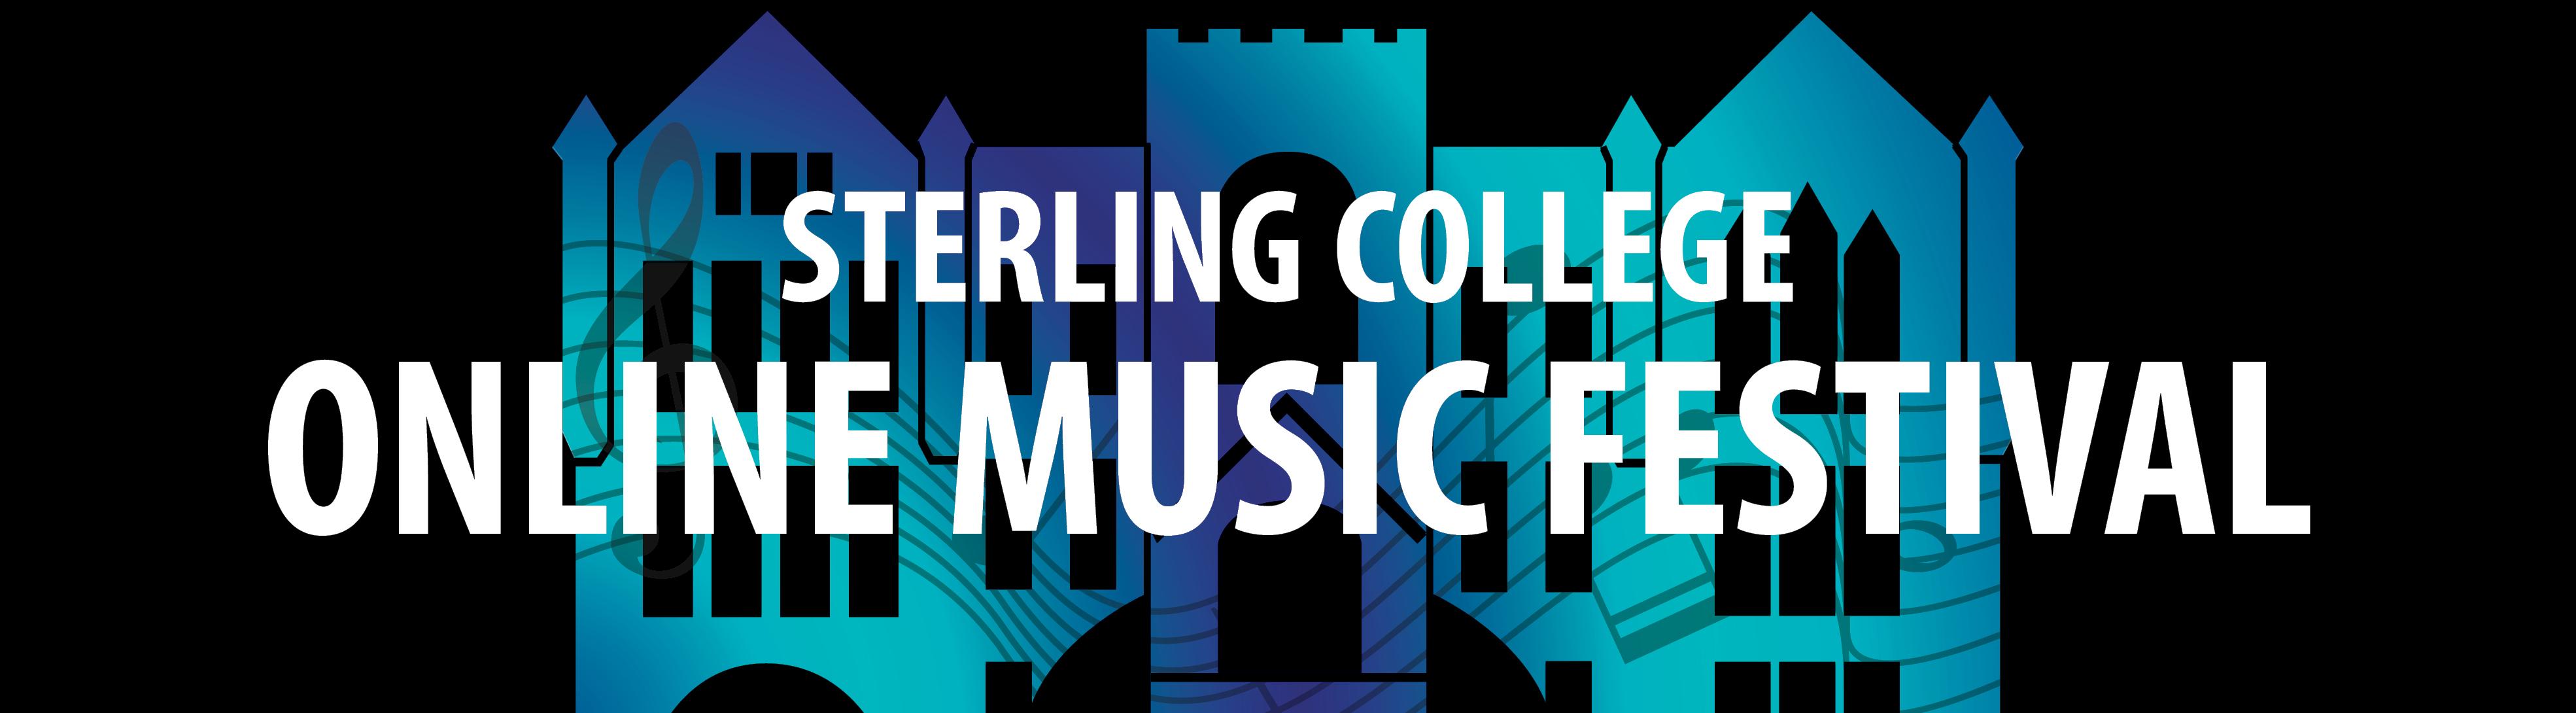 Sterling College Online Music Festival